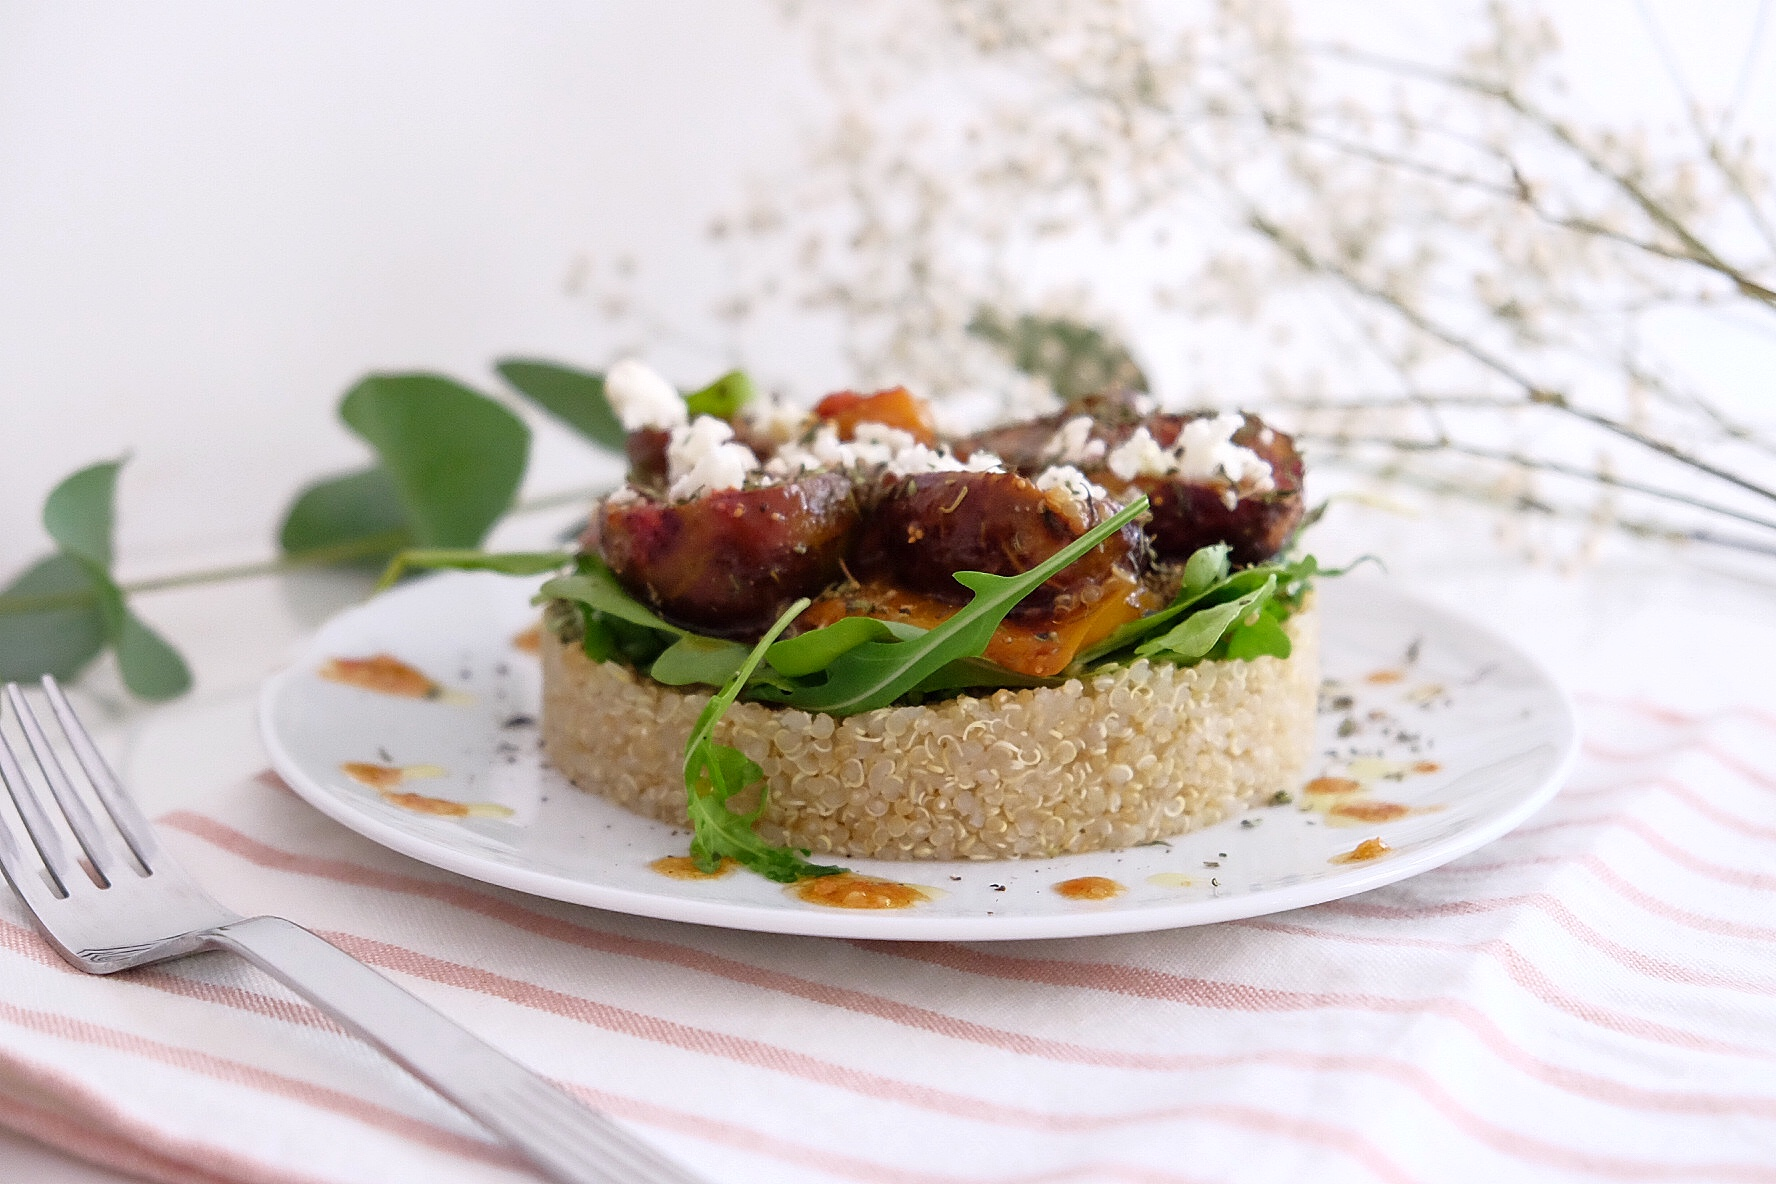 Fig, nectarine and feta salad